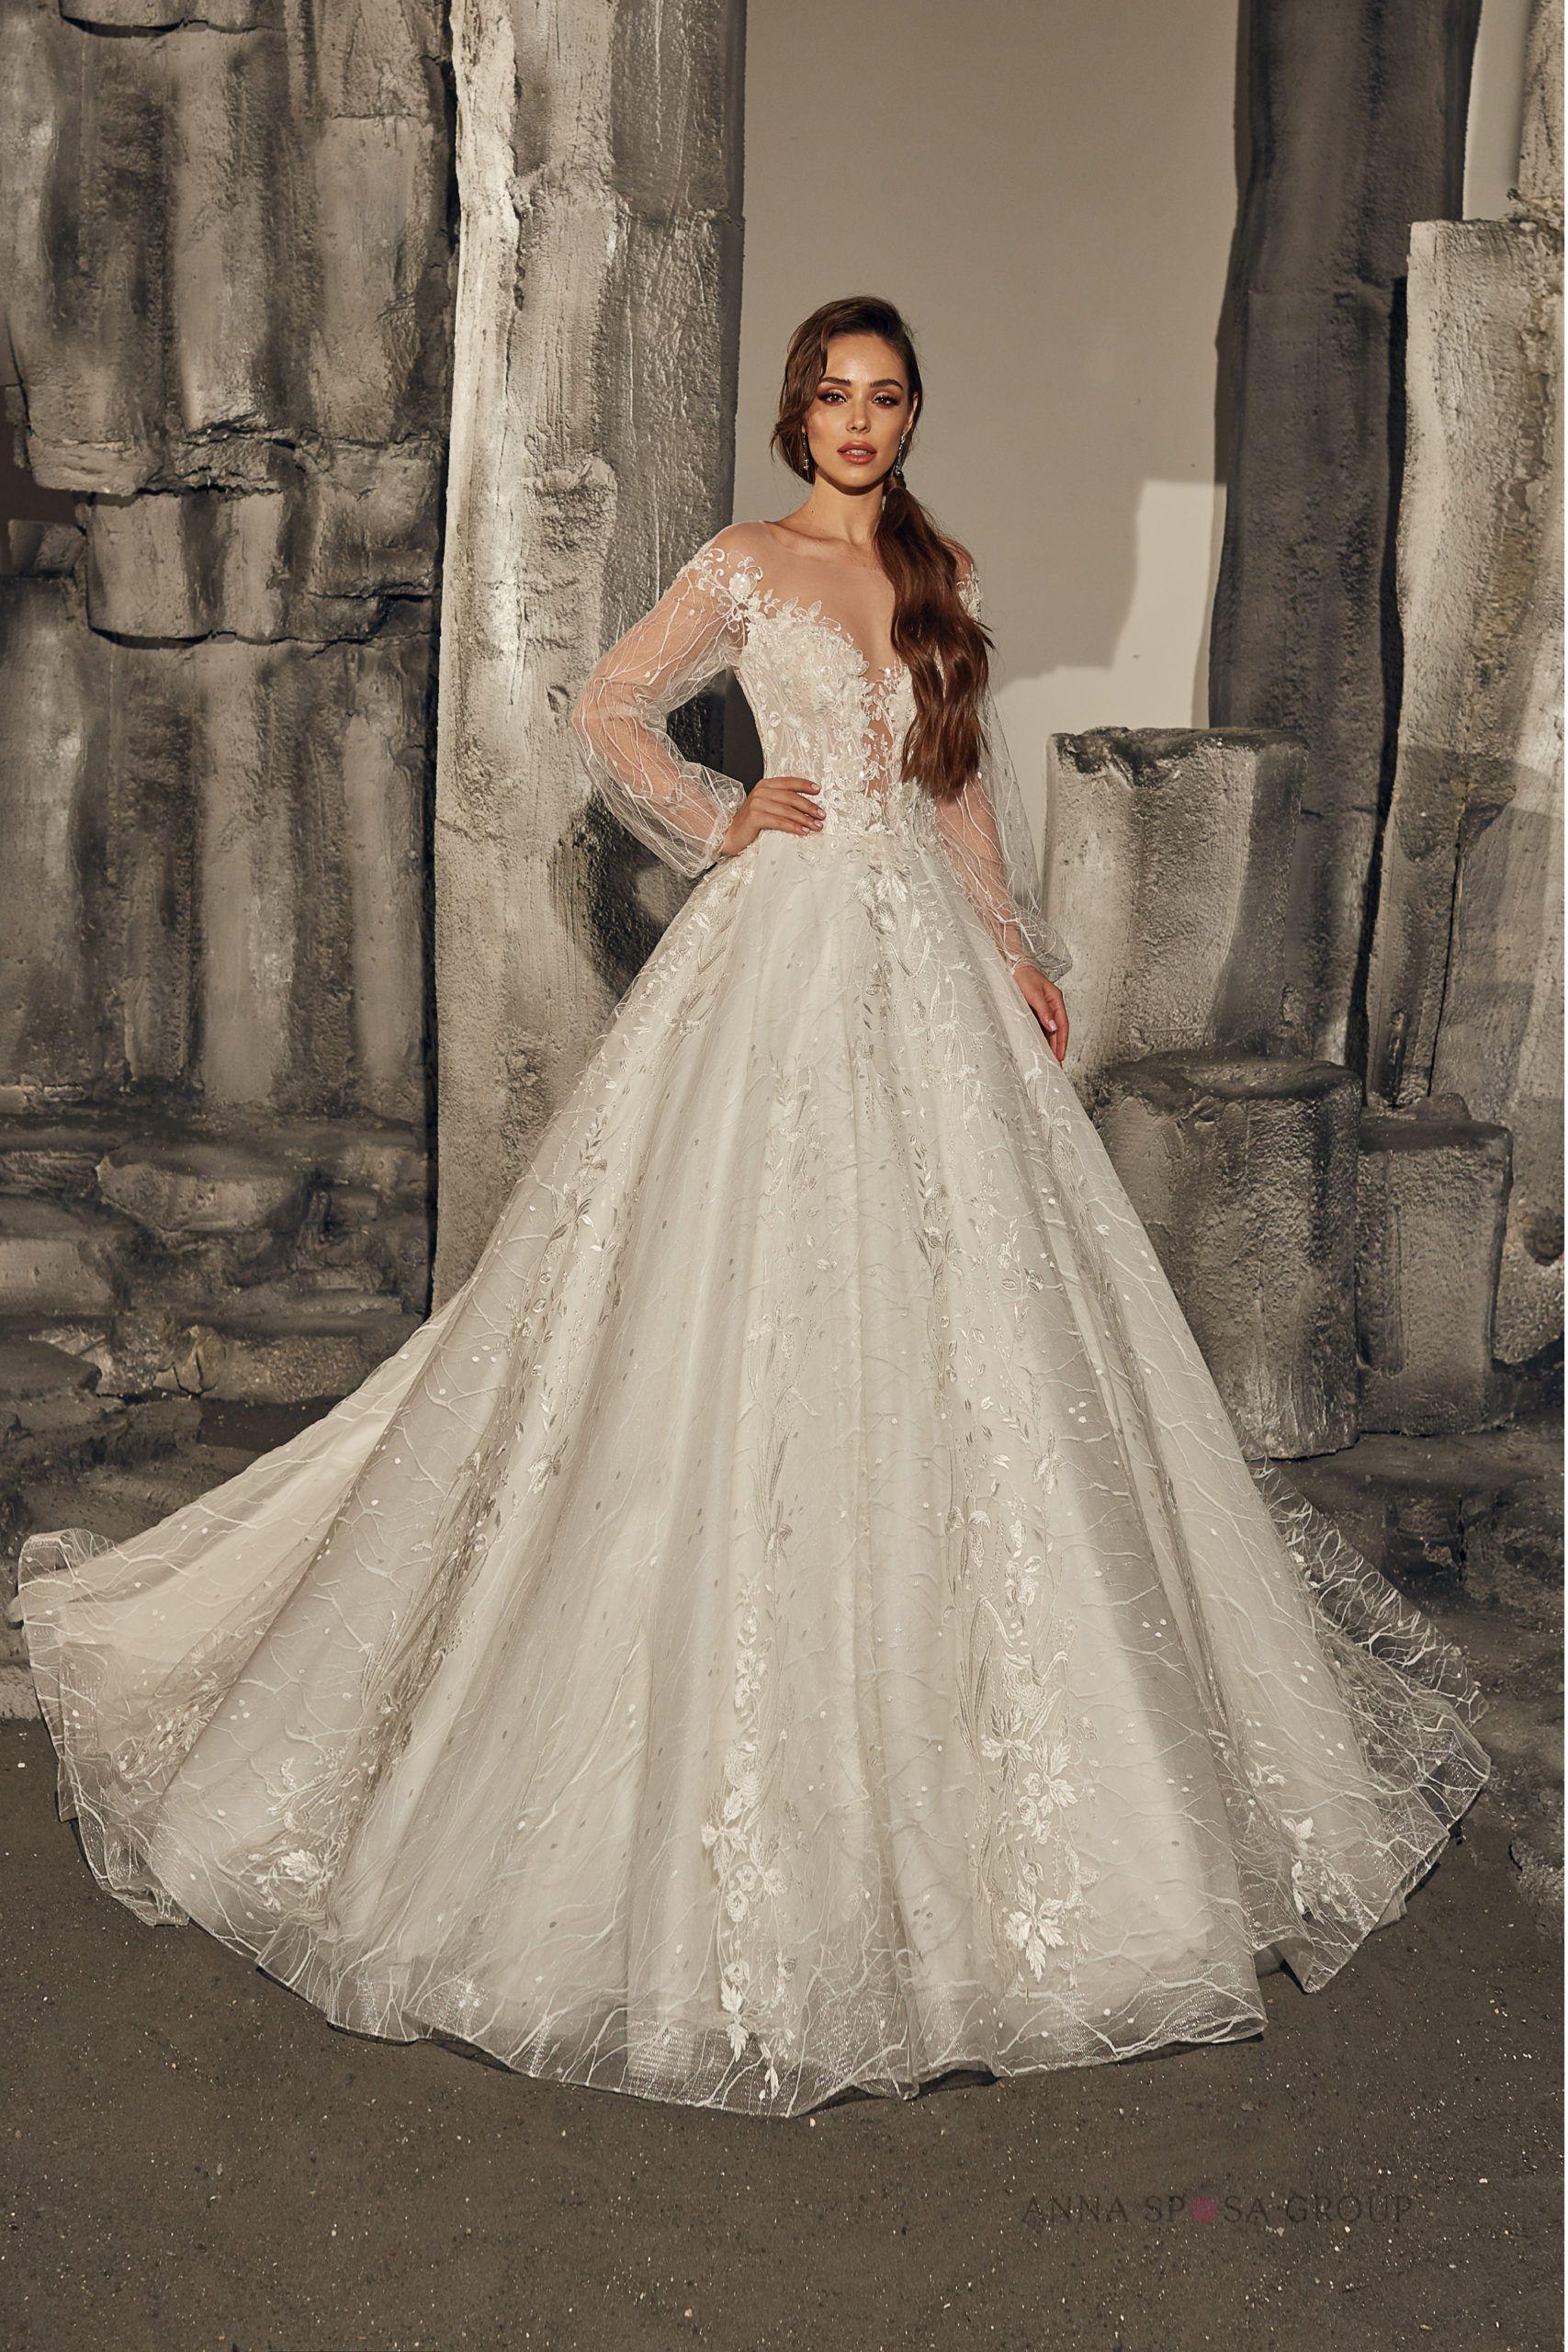 Pamela Wedding Dress Black Pearl Collection Lace Wedding Dress Vintage Black Wedding Dresses Wedding Dresses Lace [ 2560 x 1707 Pixel ]